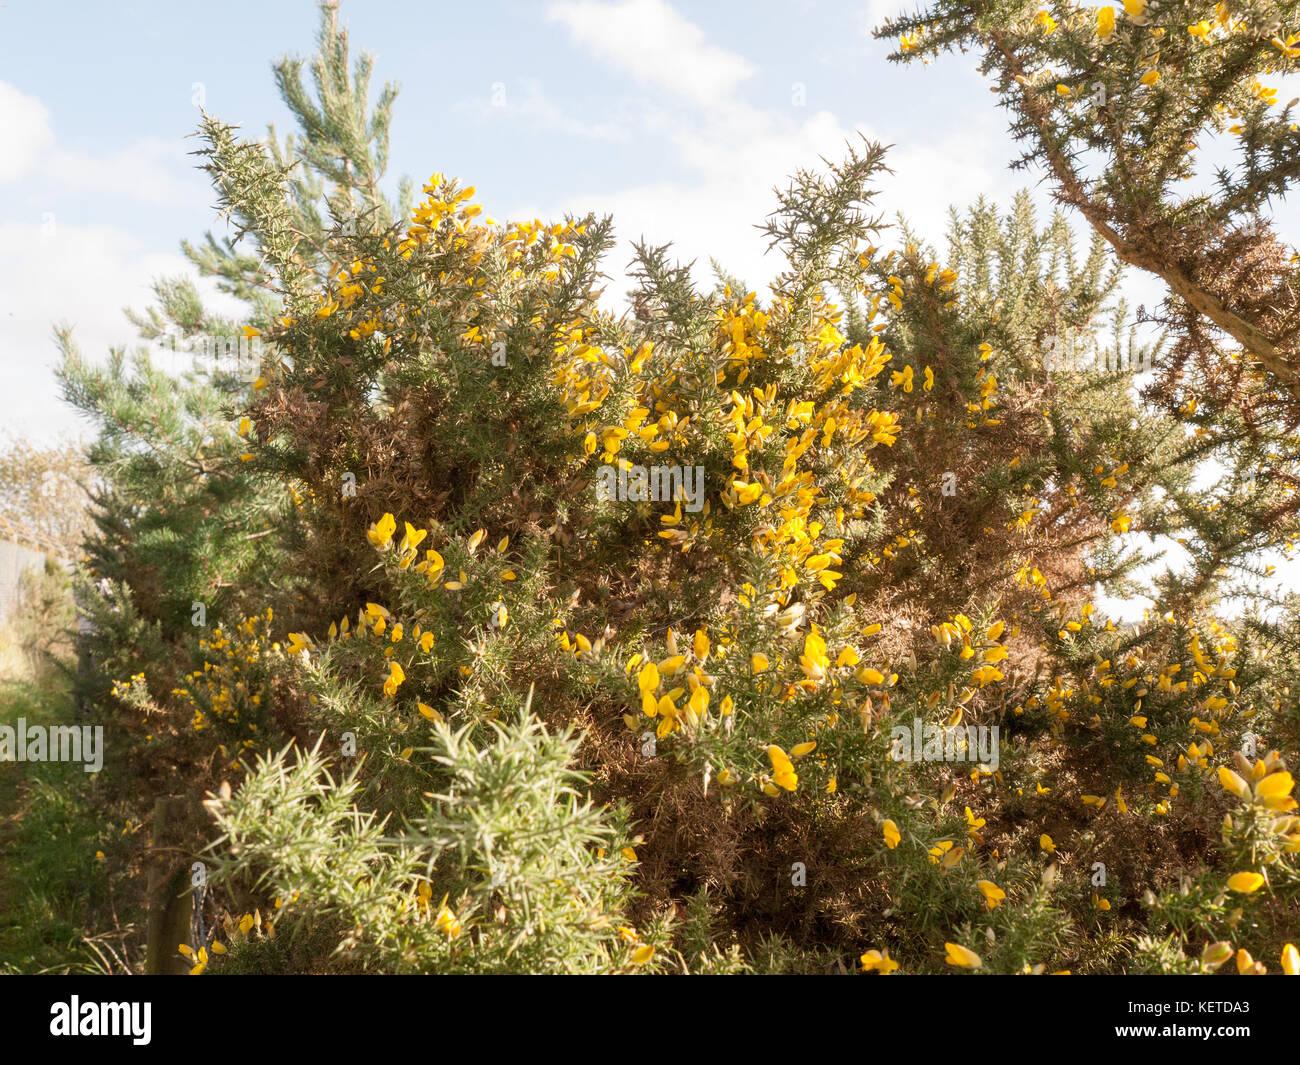 Beautiful Stunning Growing Yellow Bright Gorse Flowers On Spiky Bush